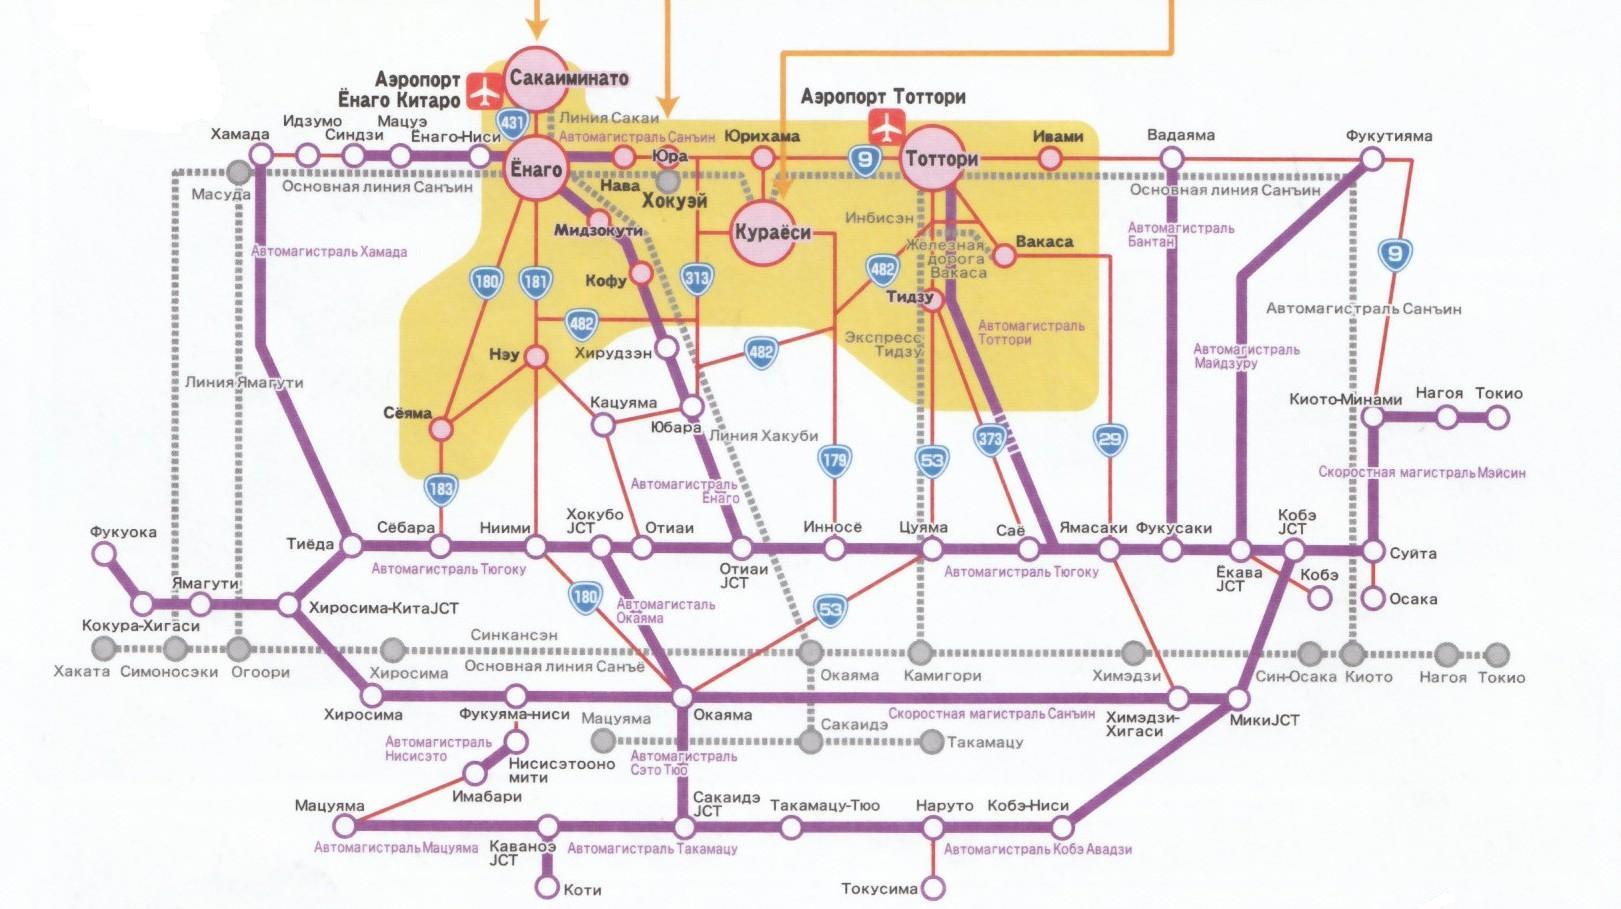 карта префектуры Тоттори, © фрагмент брошюры Департамента культуры и туризма Тоттори